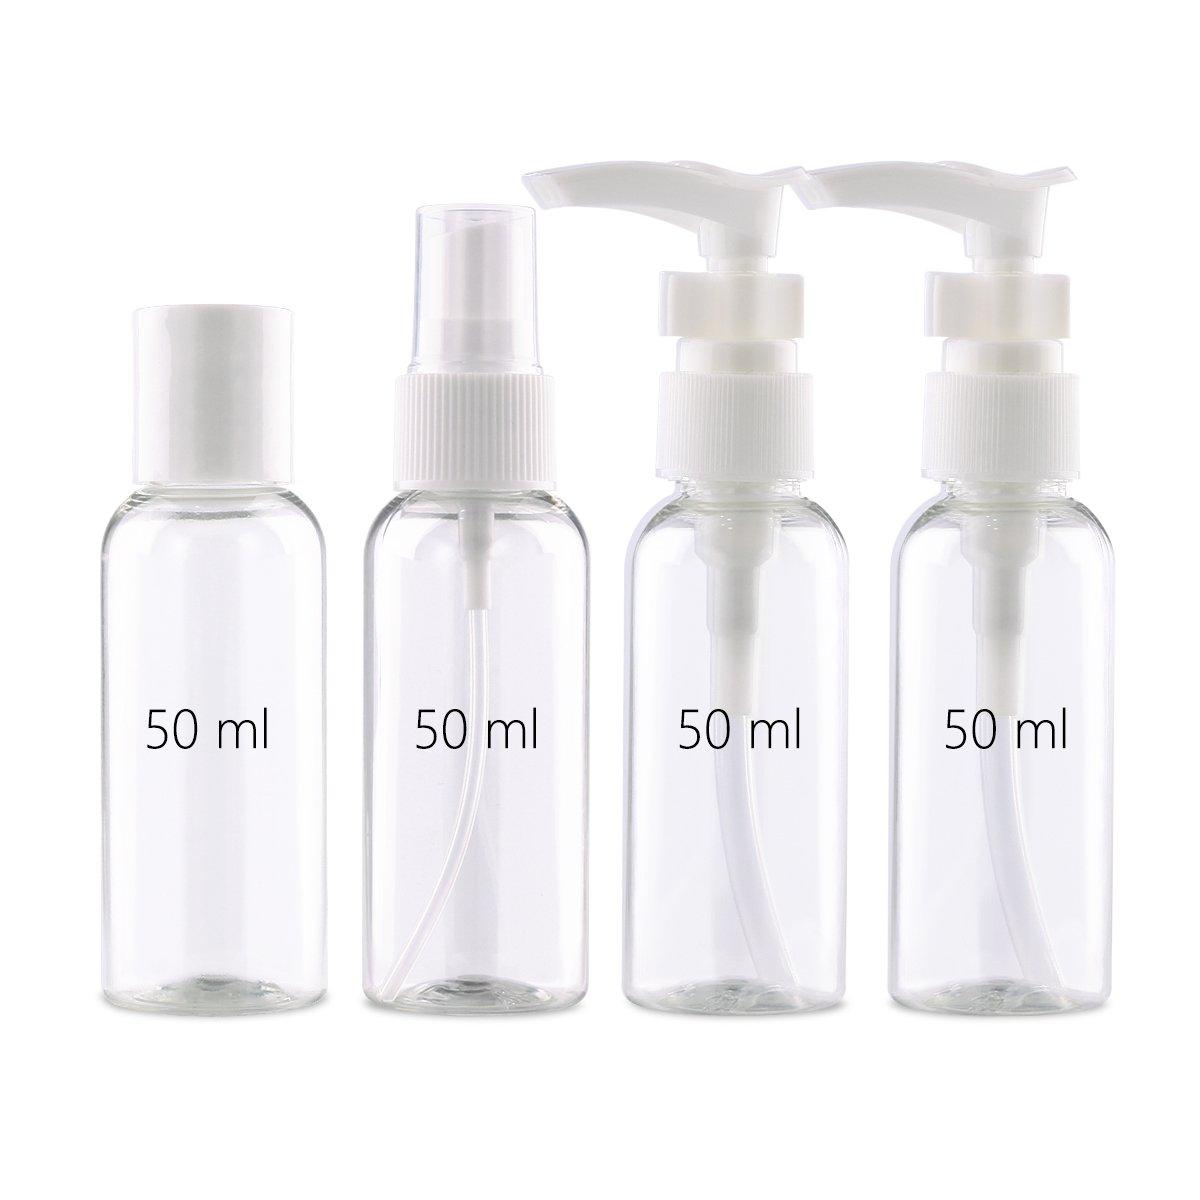 af52691990fc TSA Approved Plastic Travel Bottles Empty Set (12pcs) Toiletries & Cosmetic  Travel Size Leak Proof...